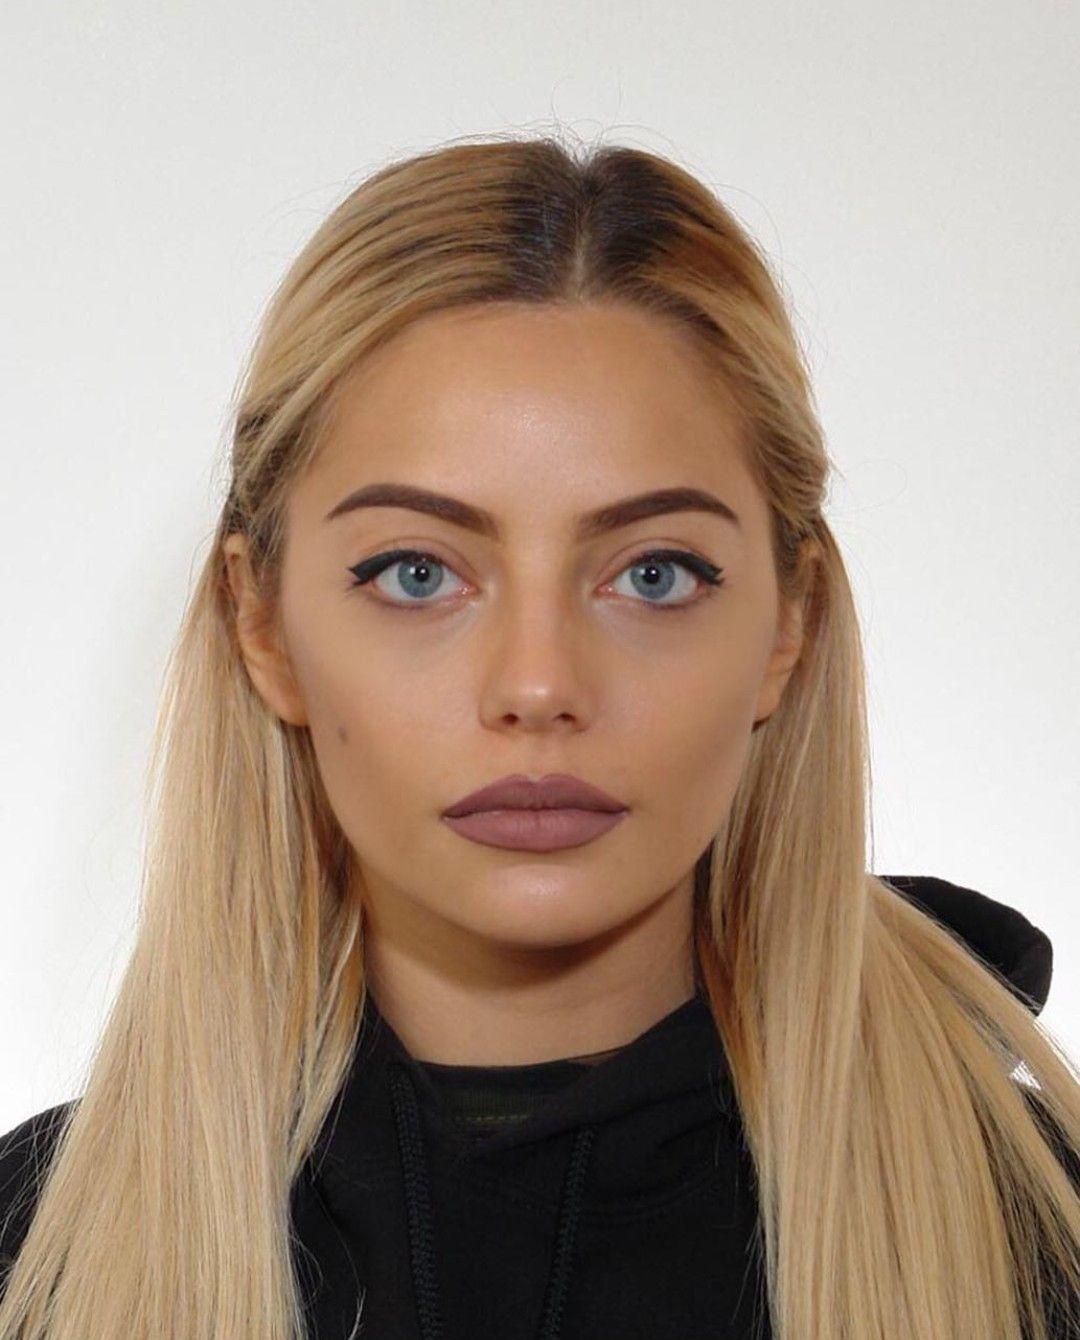 Deface Her Face Porn